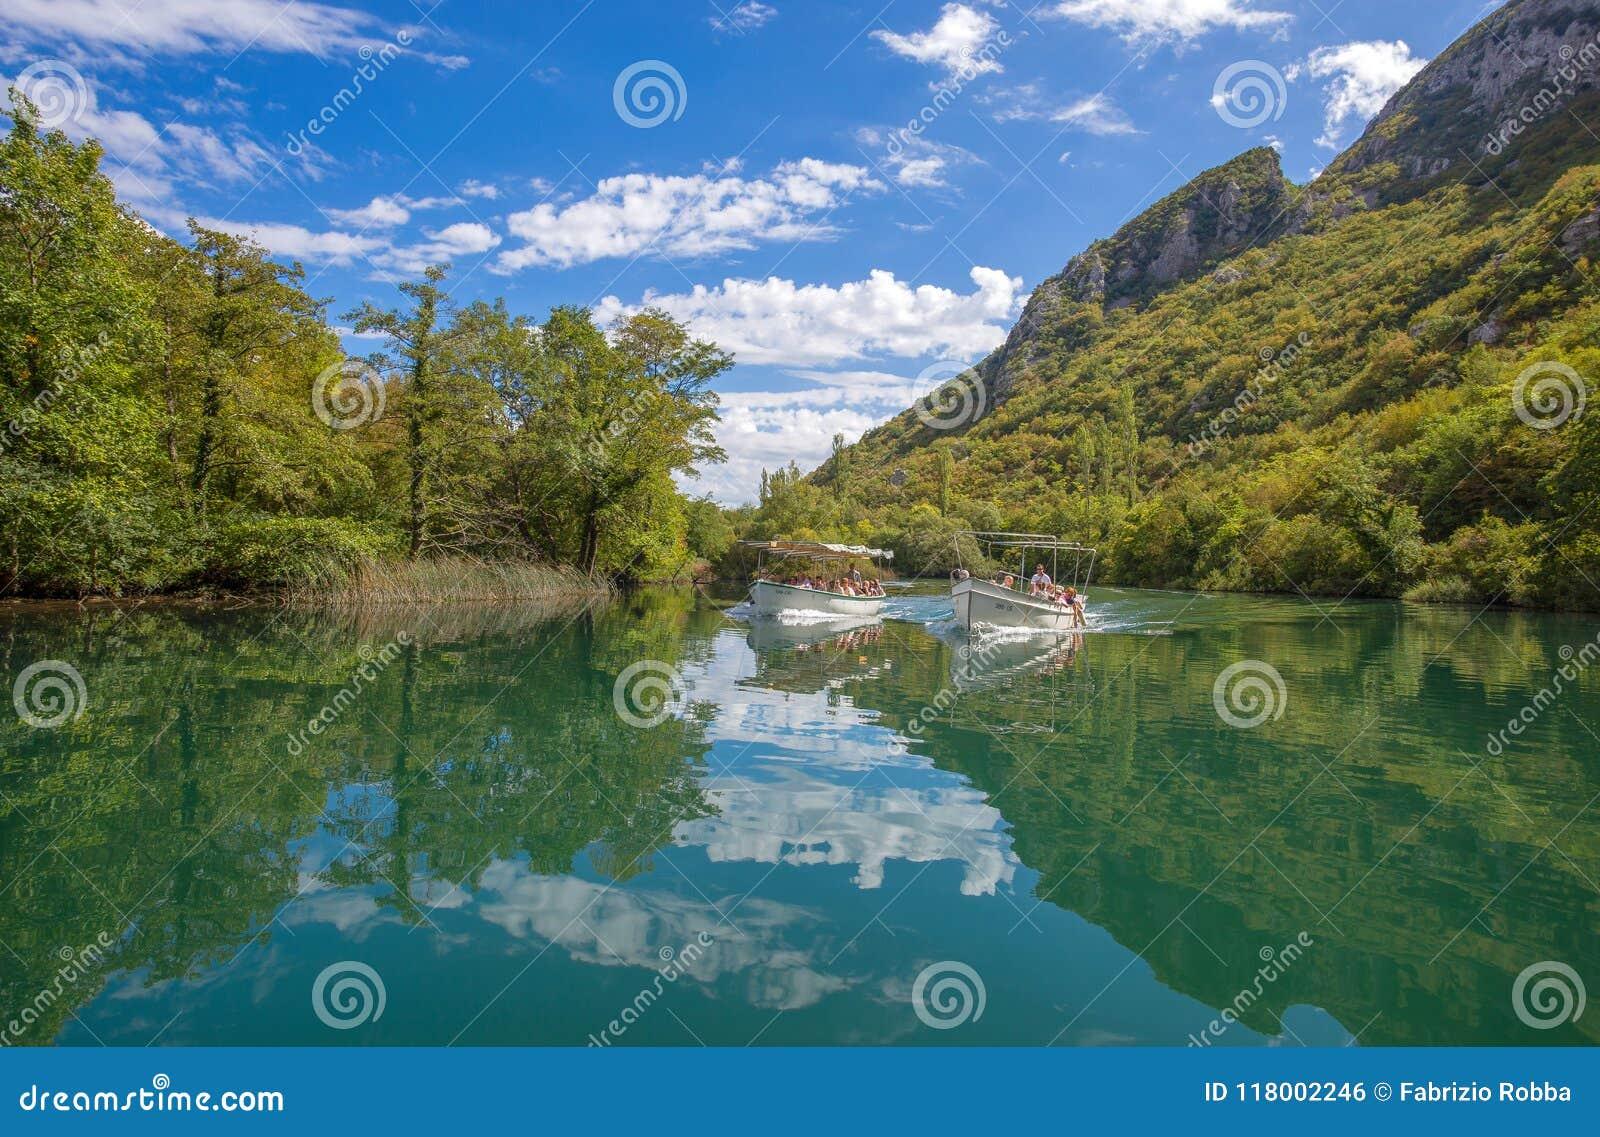 View of Cetina river around Omis Almissa city, Dalmatia, Croatia/ Europecanyons/river/green/mountains